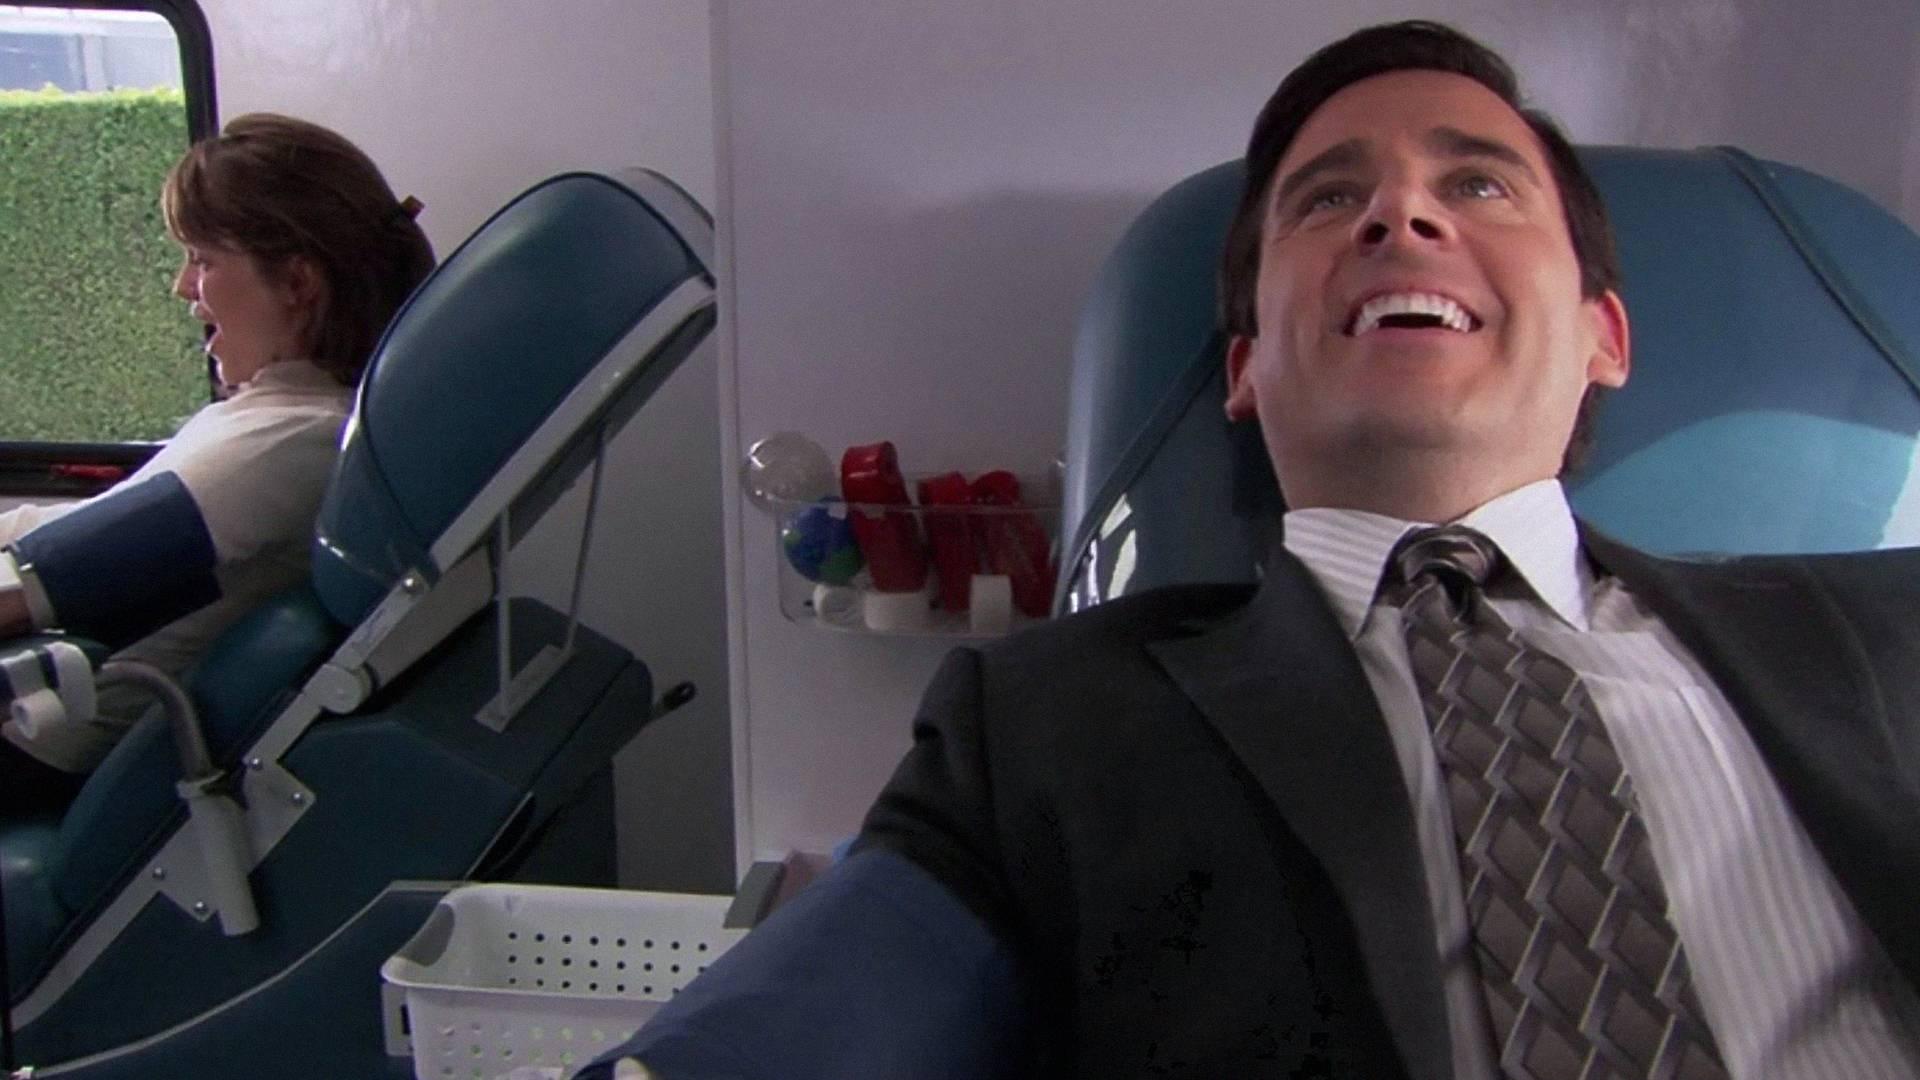 The Office Season 5 Episode 18